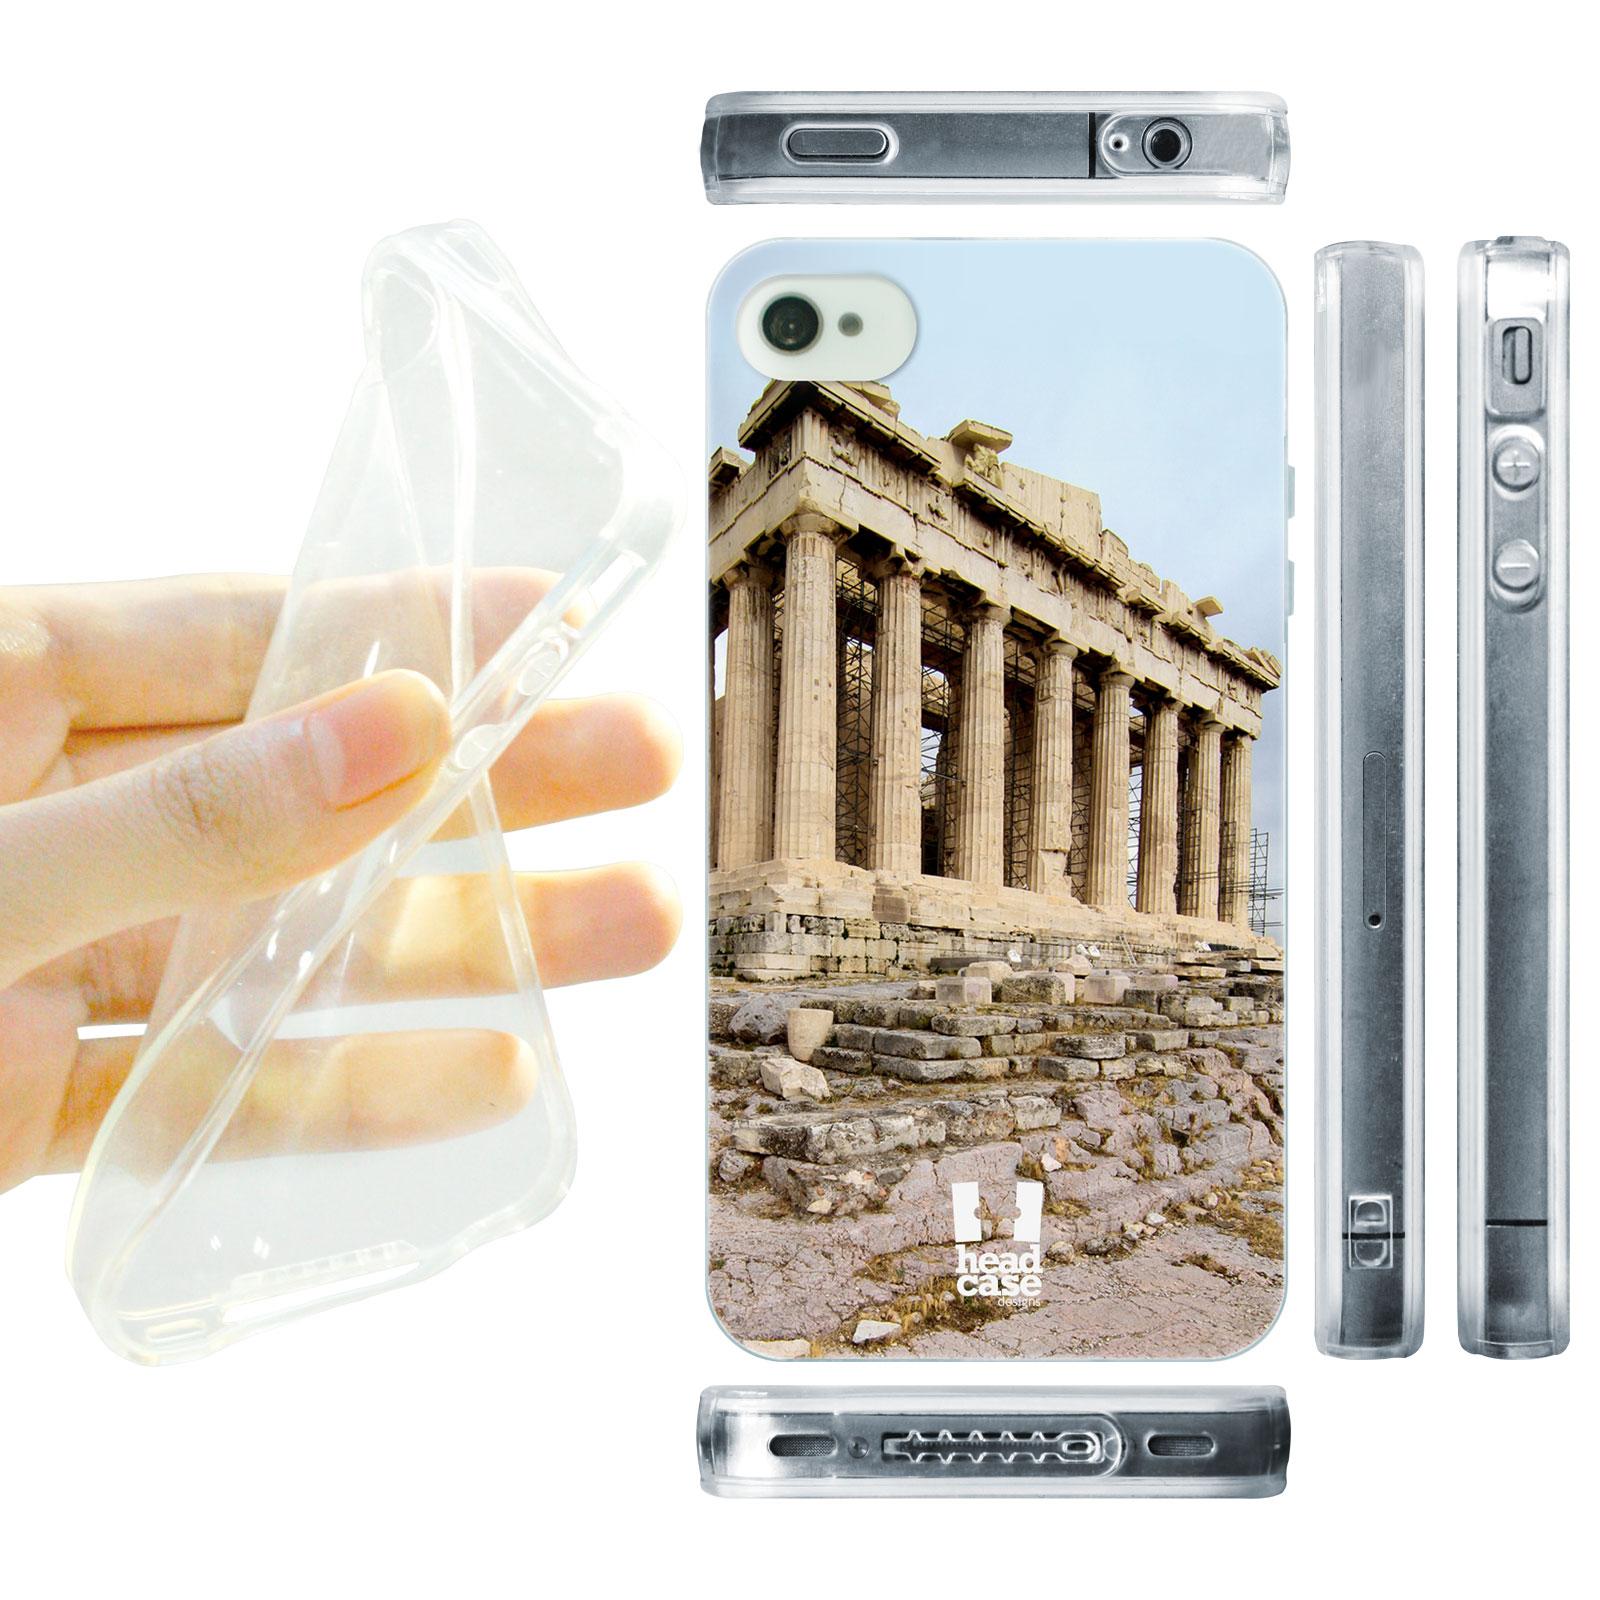 HEAD CASE silikonový obal na mobil Iphone 4/4S foto Parthská stavba